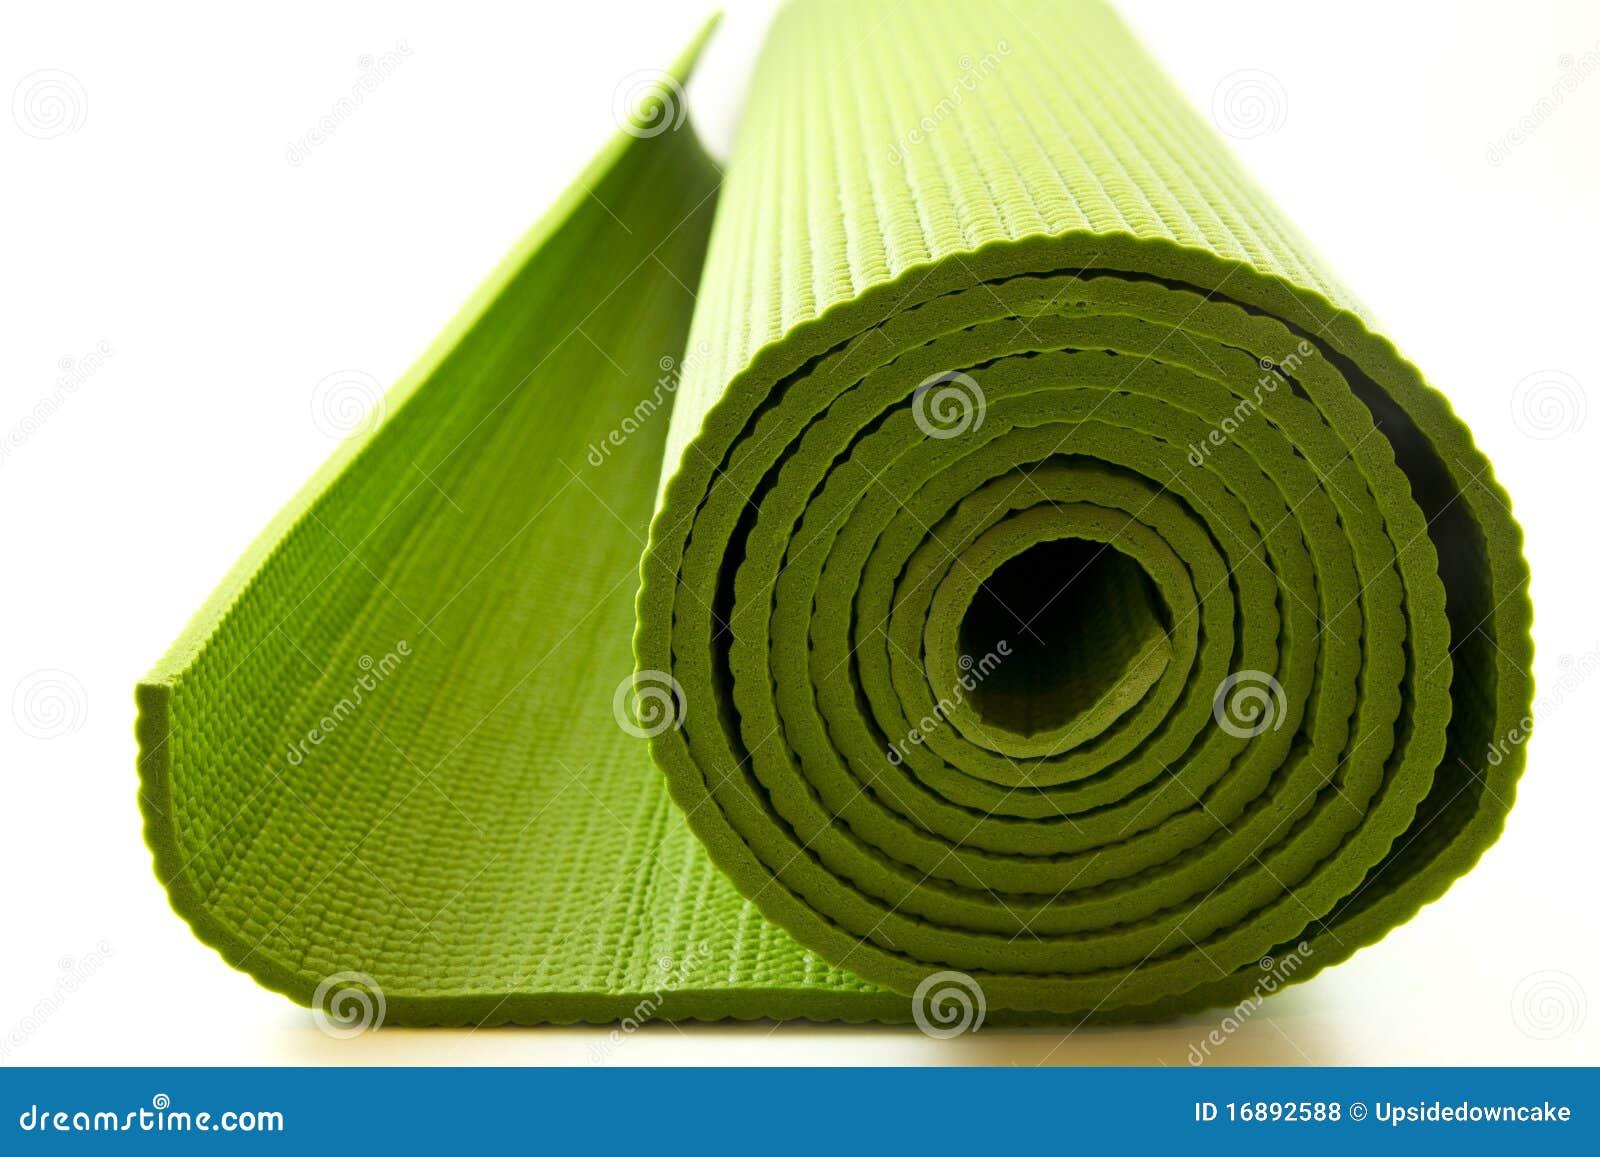 Yoga Mattress Royalty Free Stock s Image